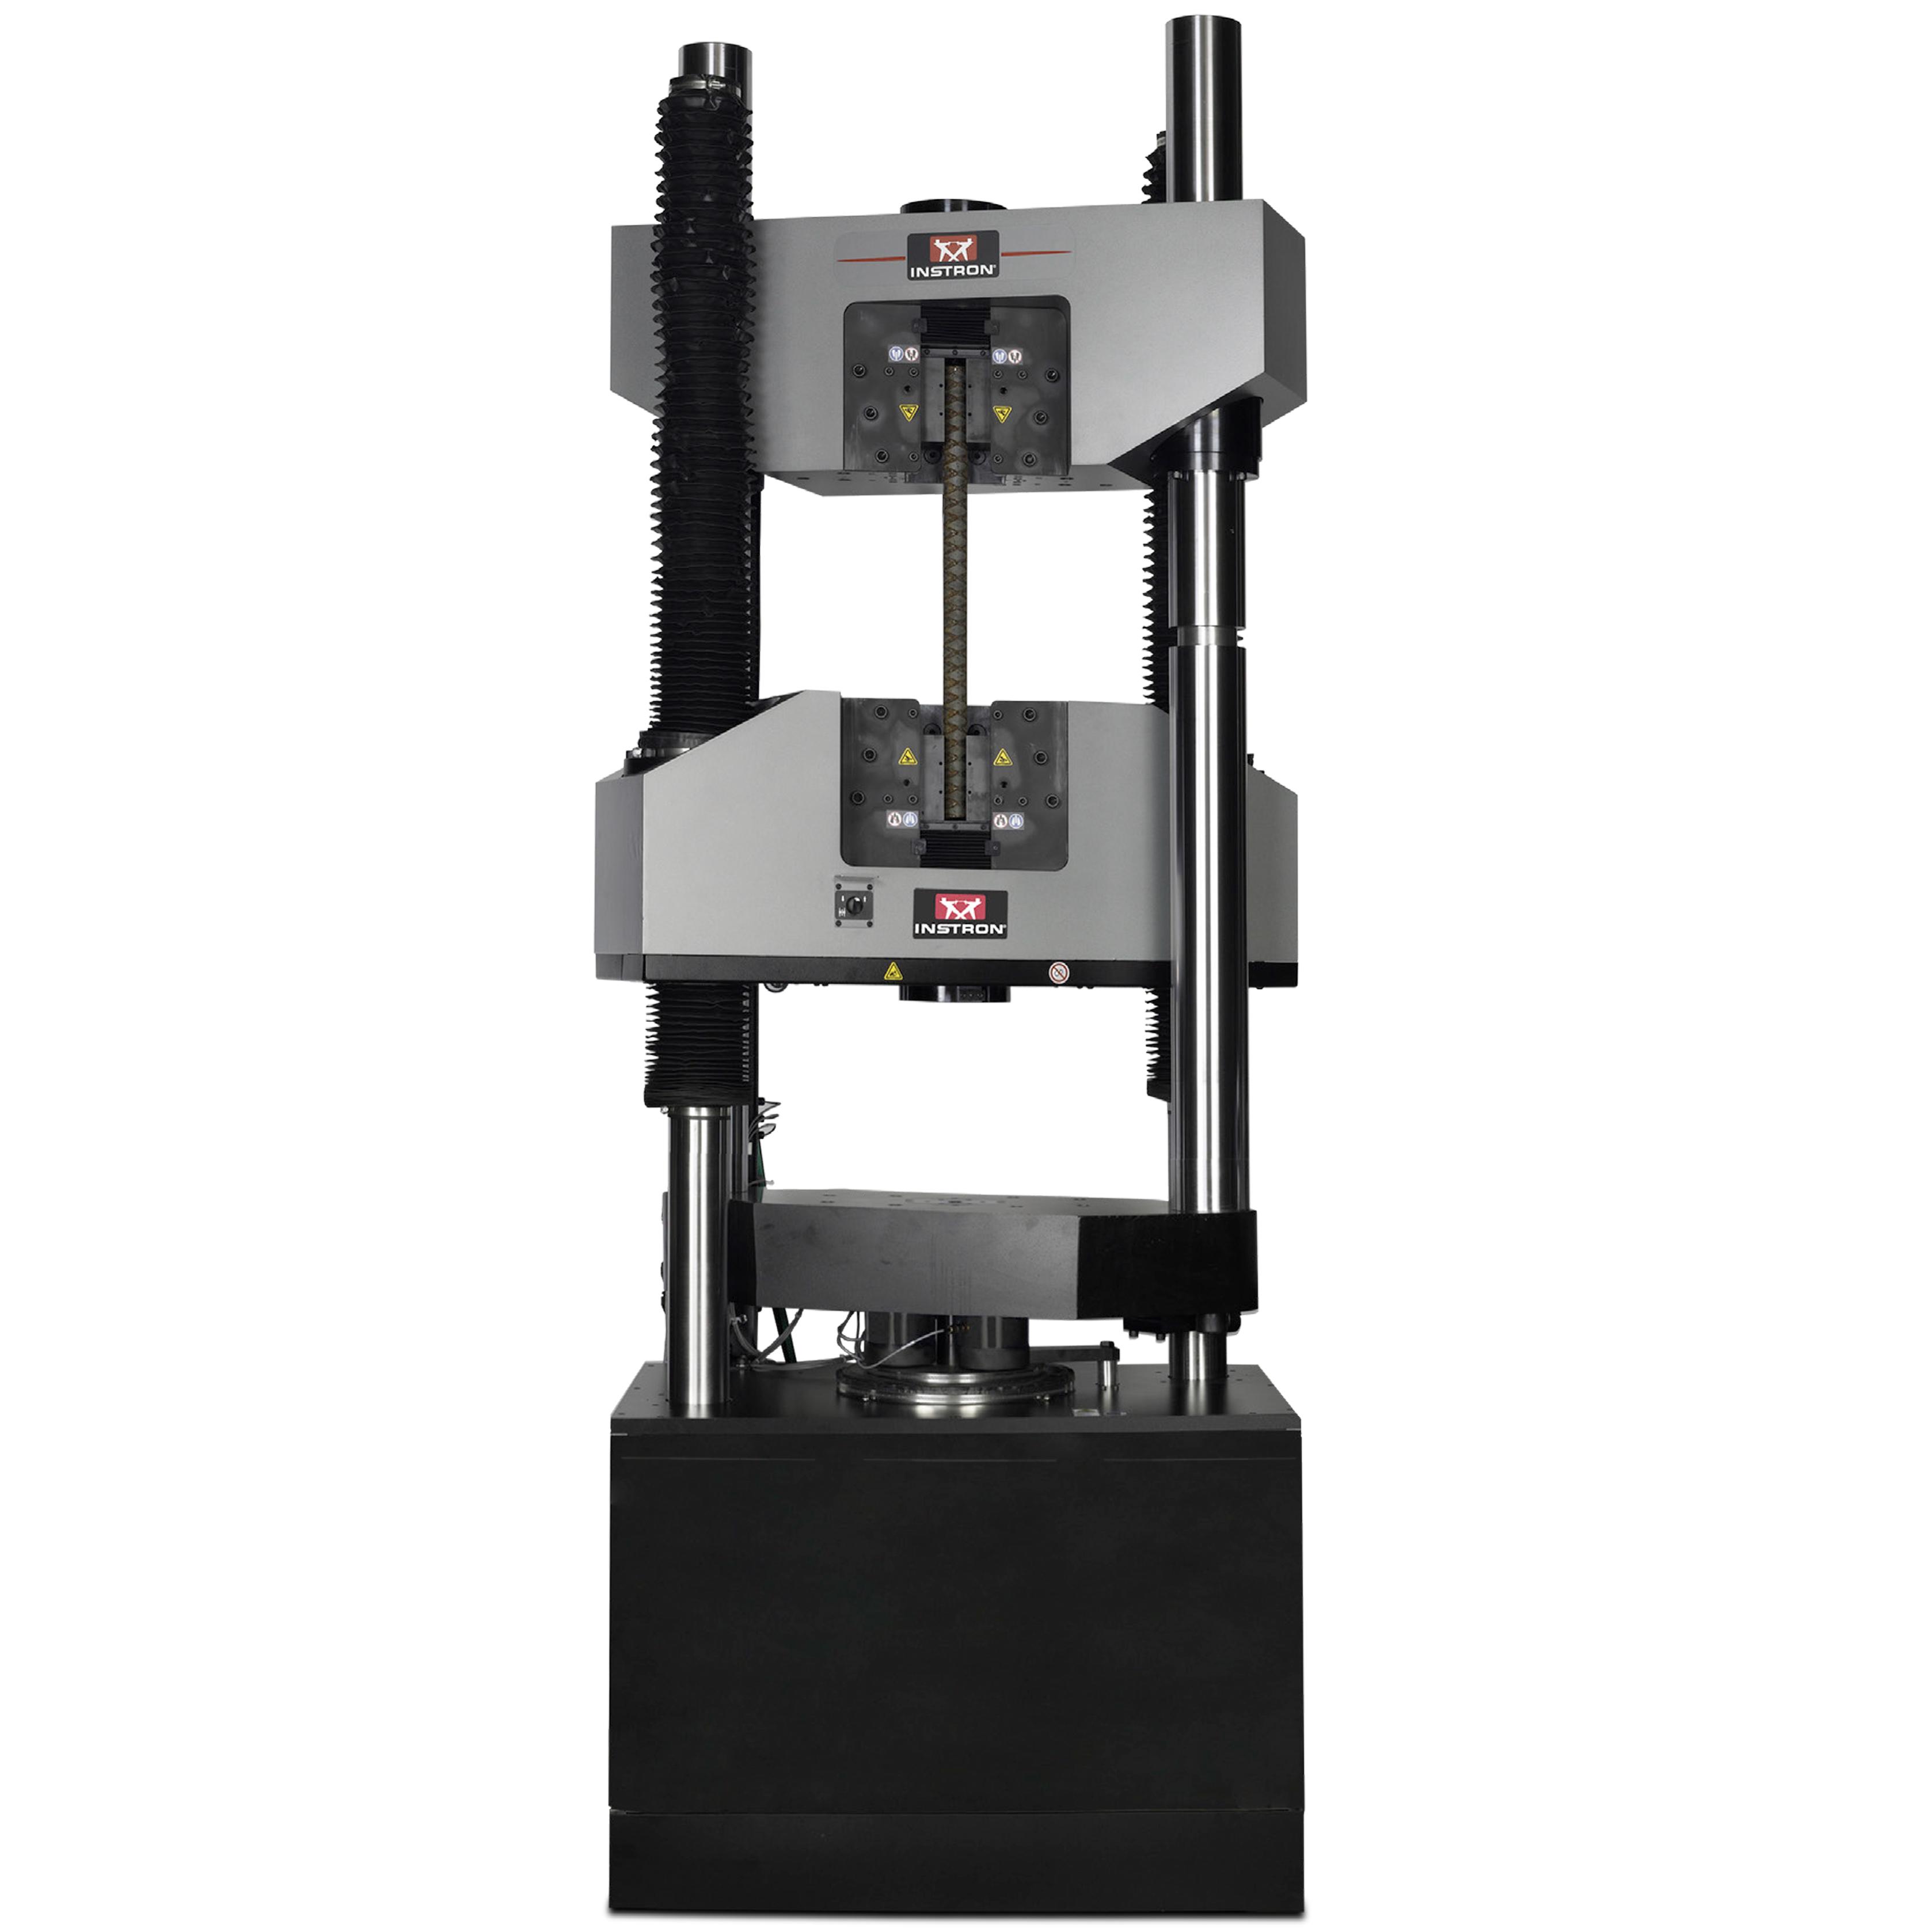 Serie industrial modelo HDX